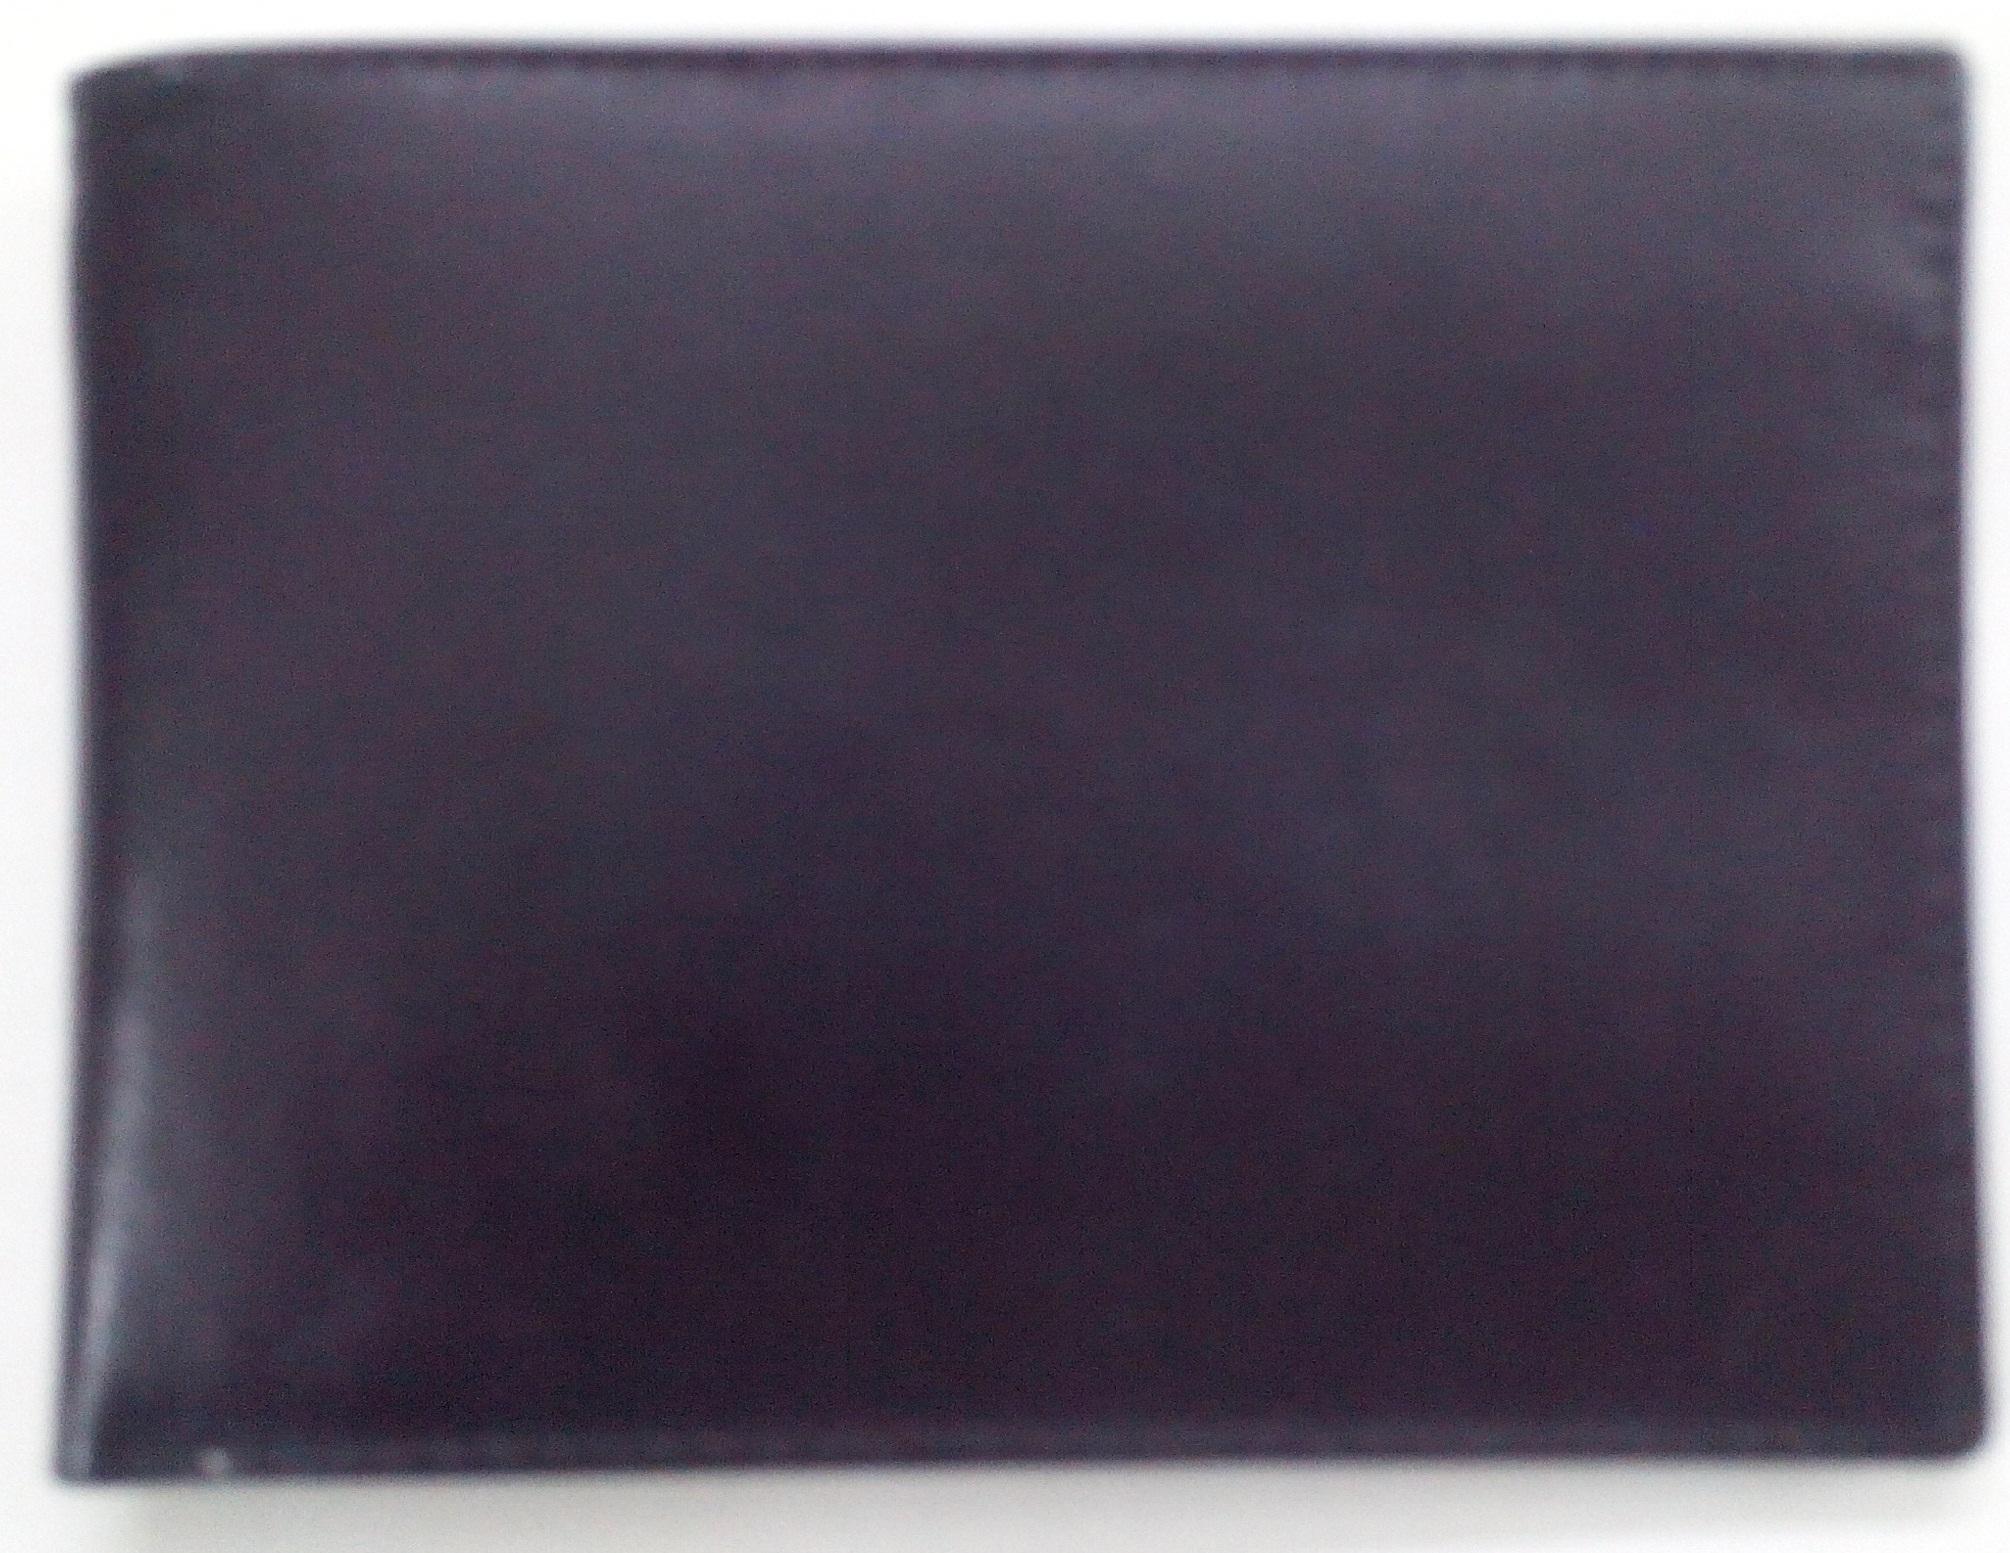 Classic Executive Wallet